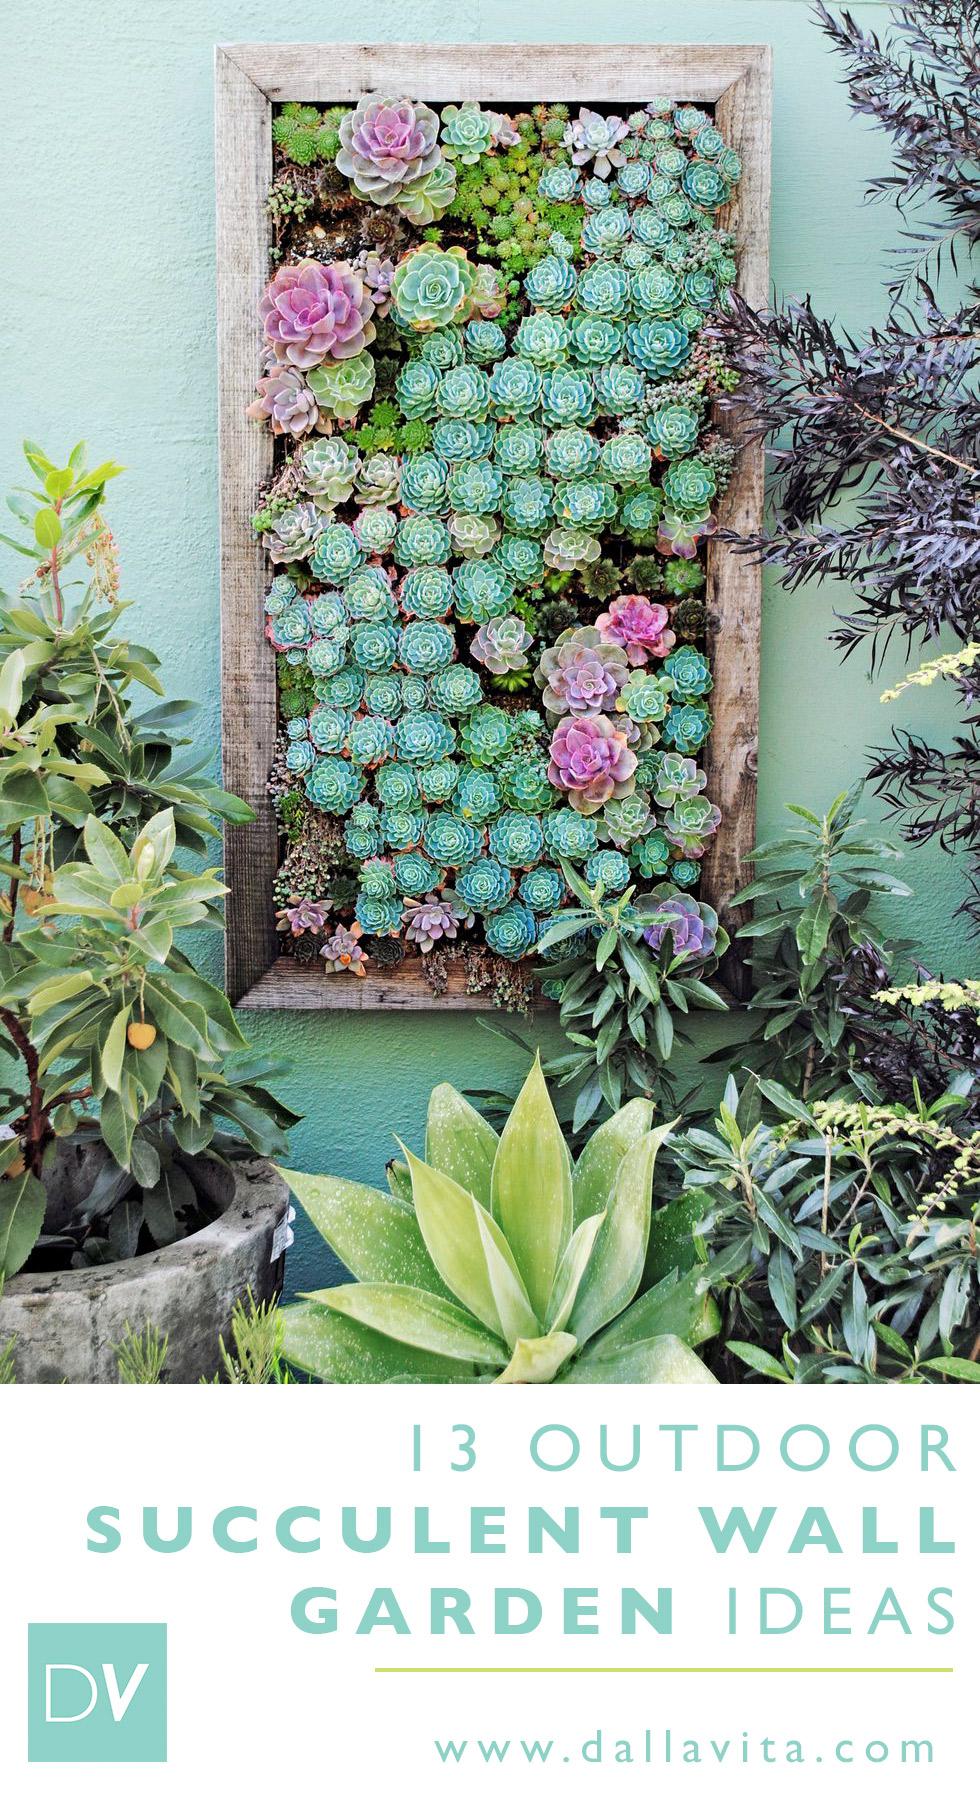 13 Outdoor Vertical Succulent Gardens - Dalla Vita